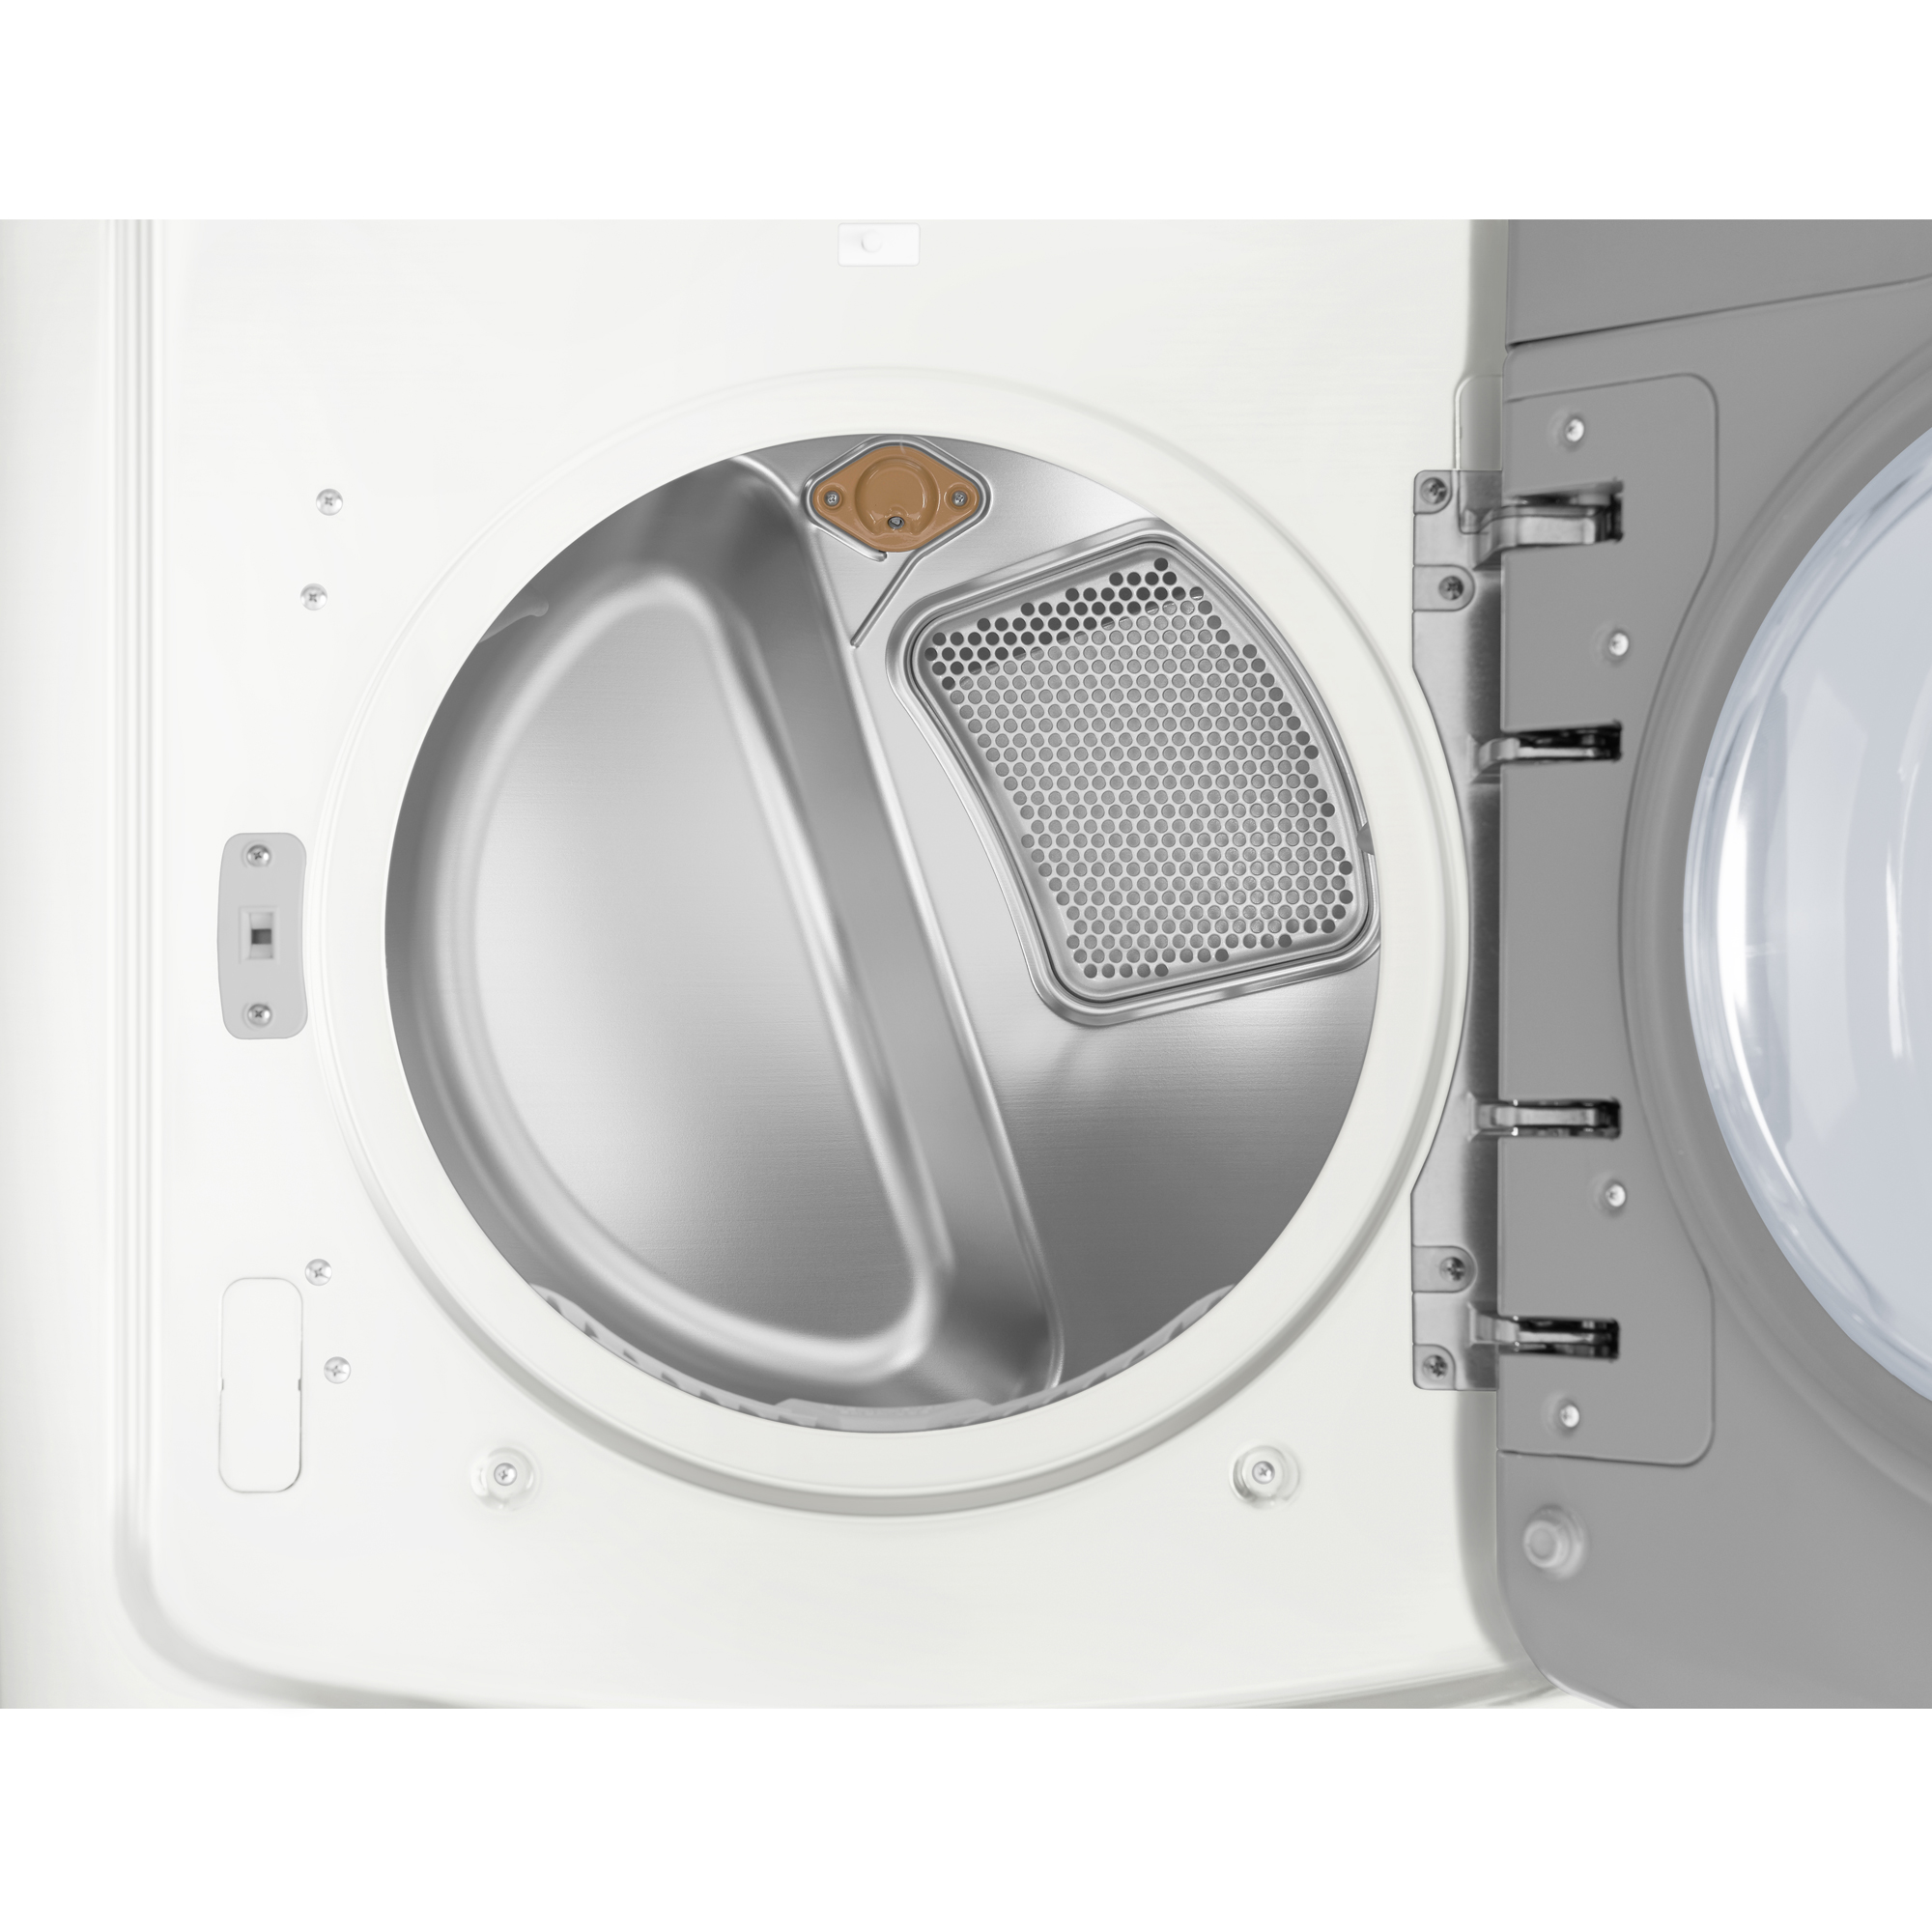 LG DLEX9000W 9.0 cu. ft. Mega Capacity Electric Dryer w/ TurboSteam™ – White